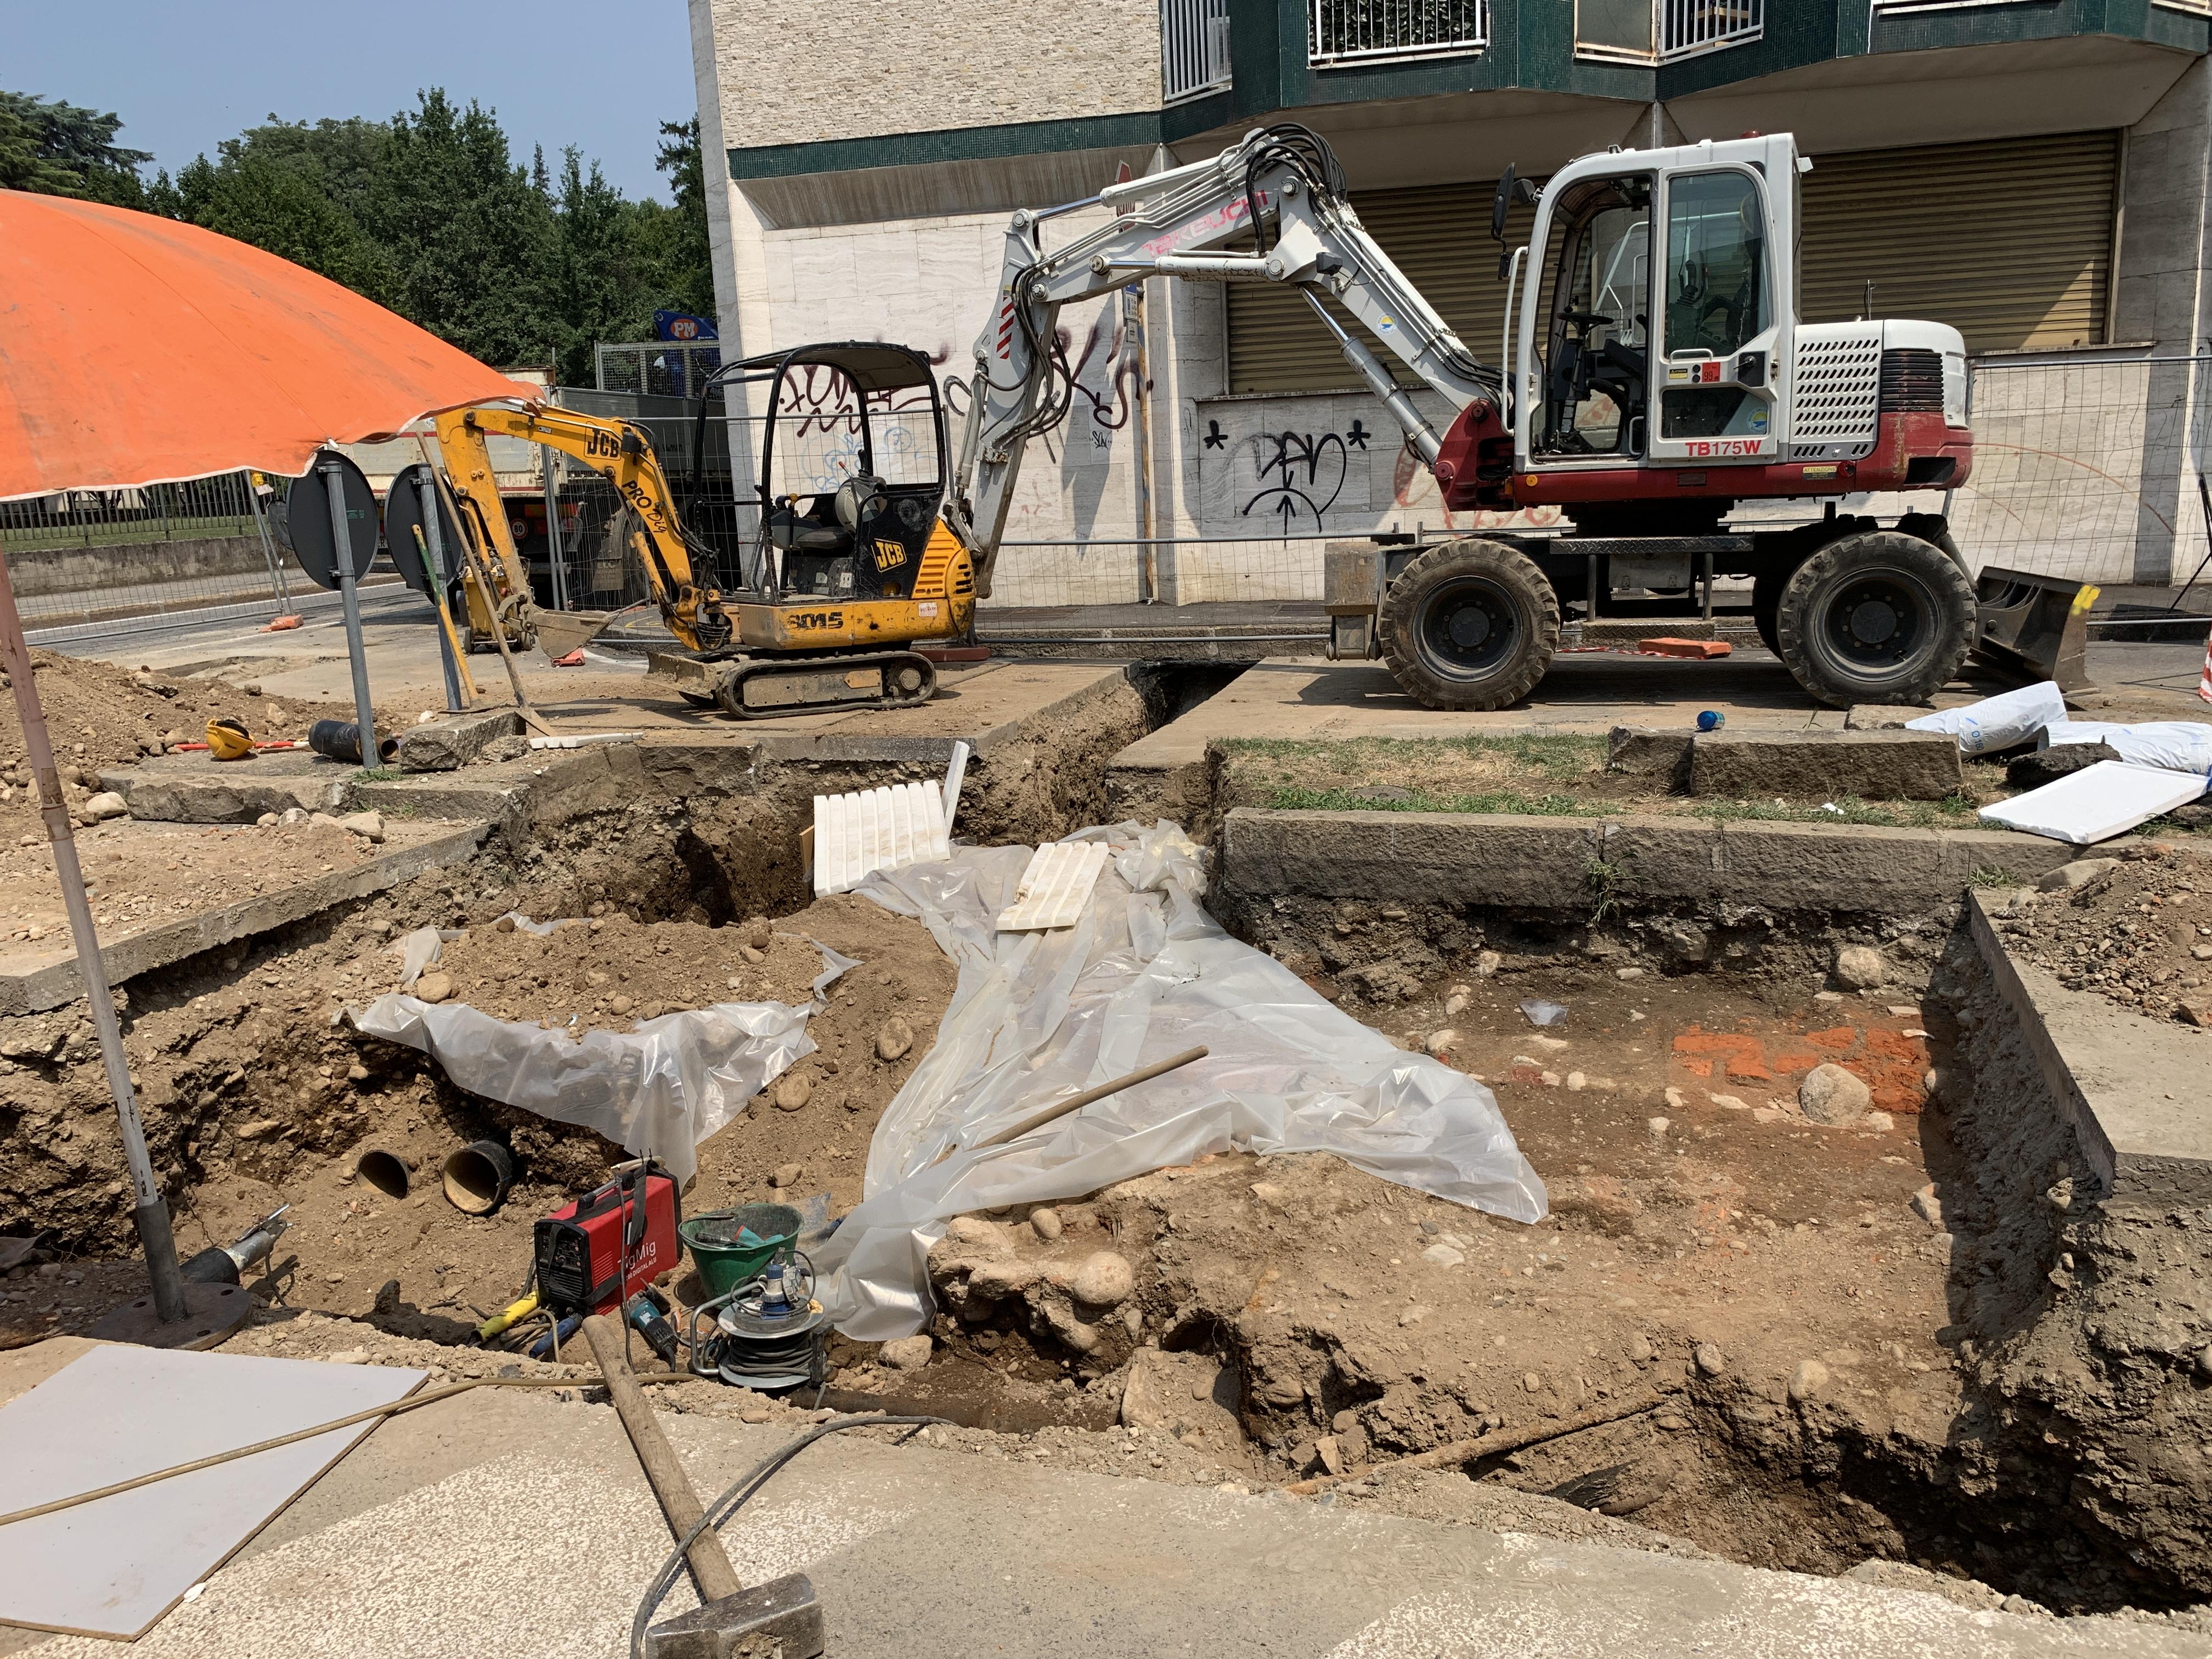 busto parona scavi piazzetta 1